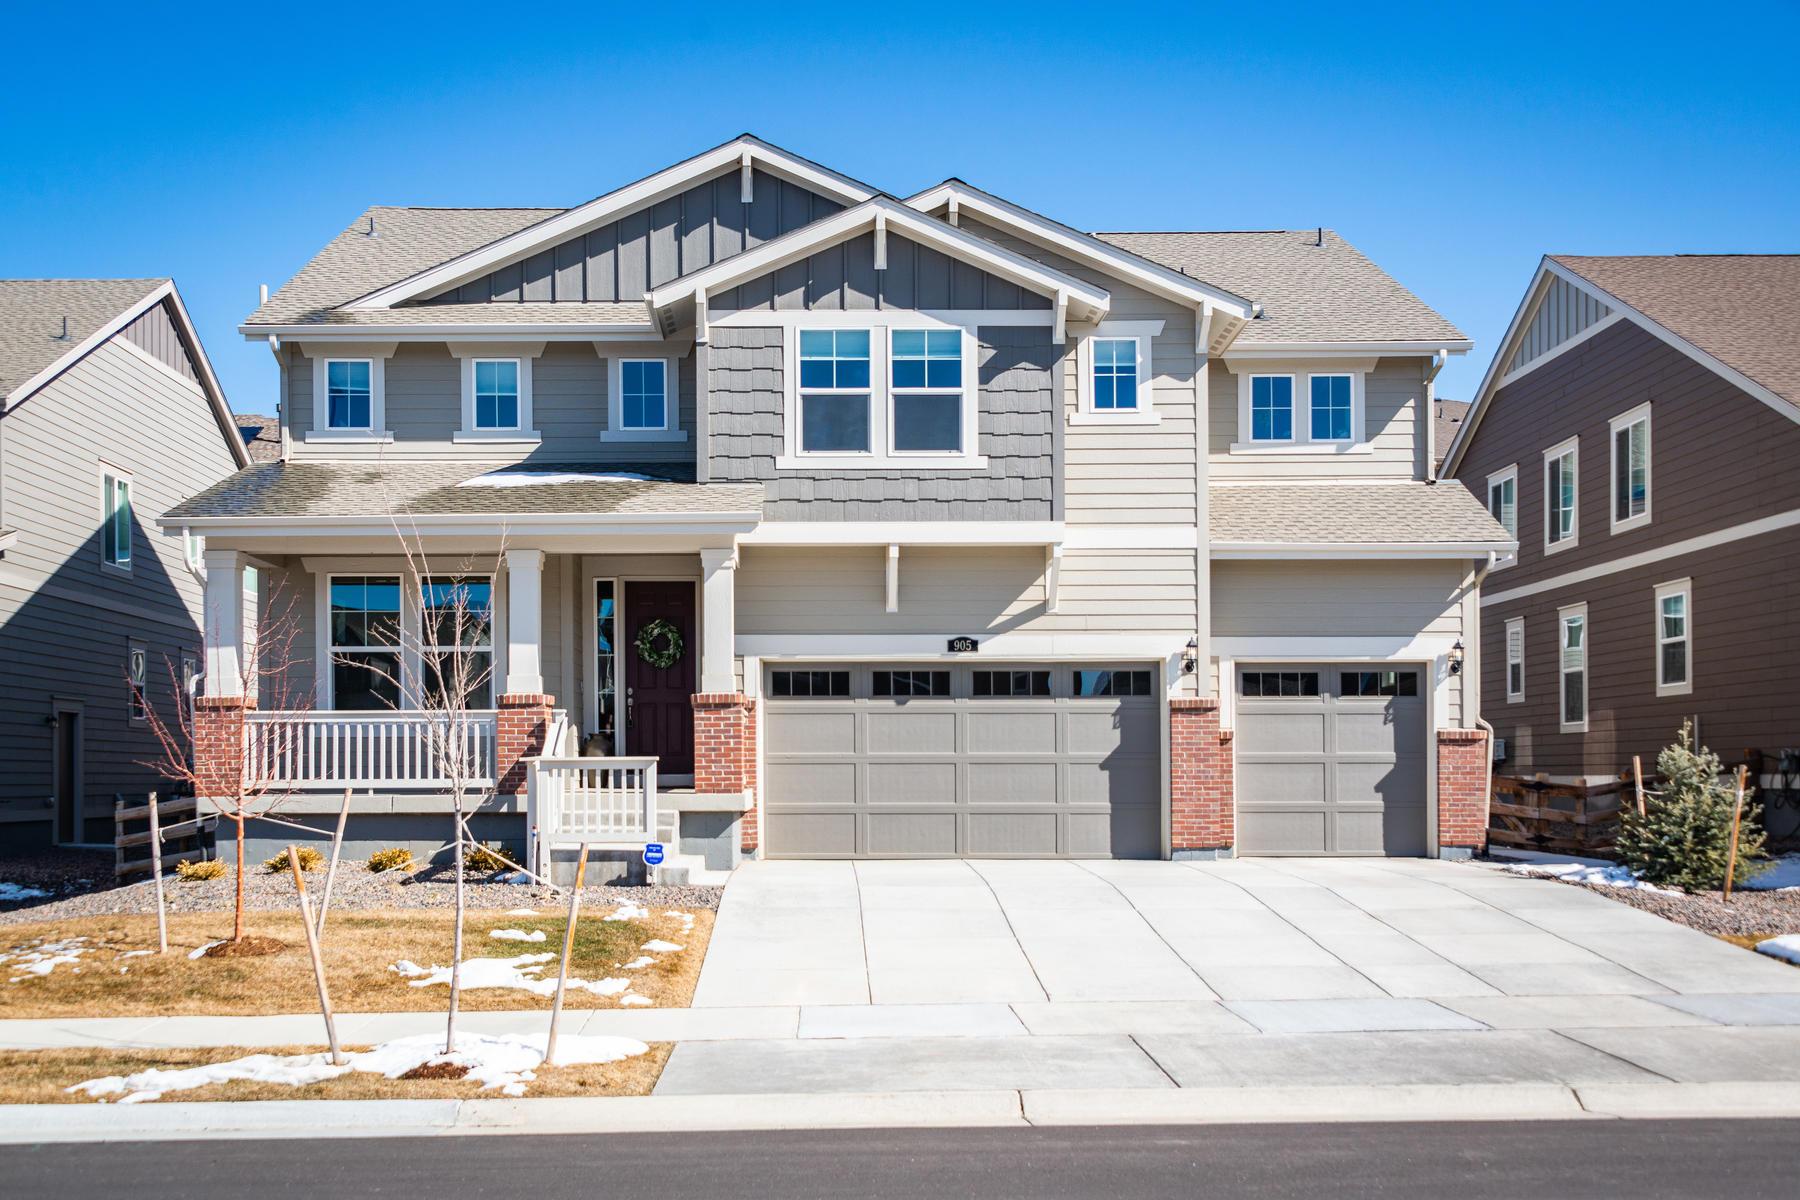 Single Family Homes のために 売買 アット Inviting Bright And Open Two-Story 905 Dakota Ln, Erie, コロラド 80516 アメリカ